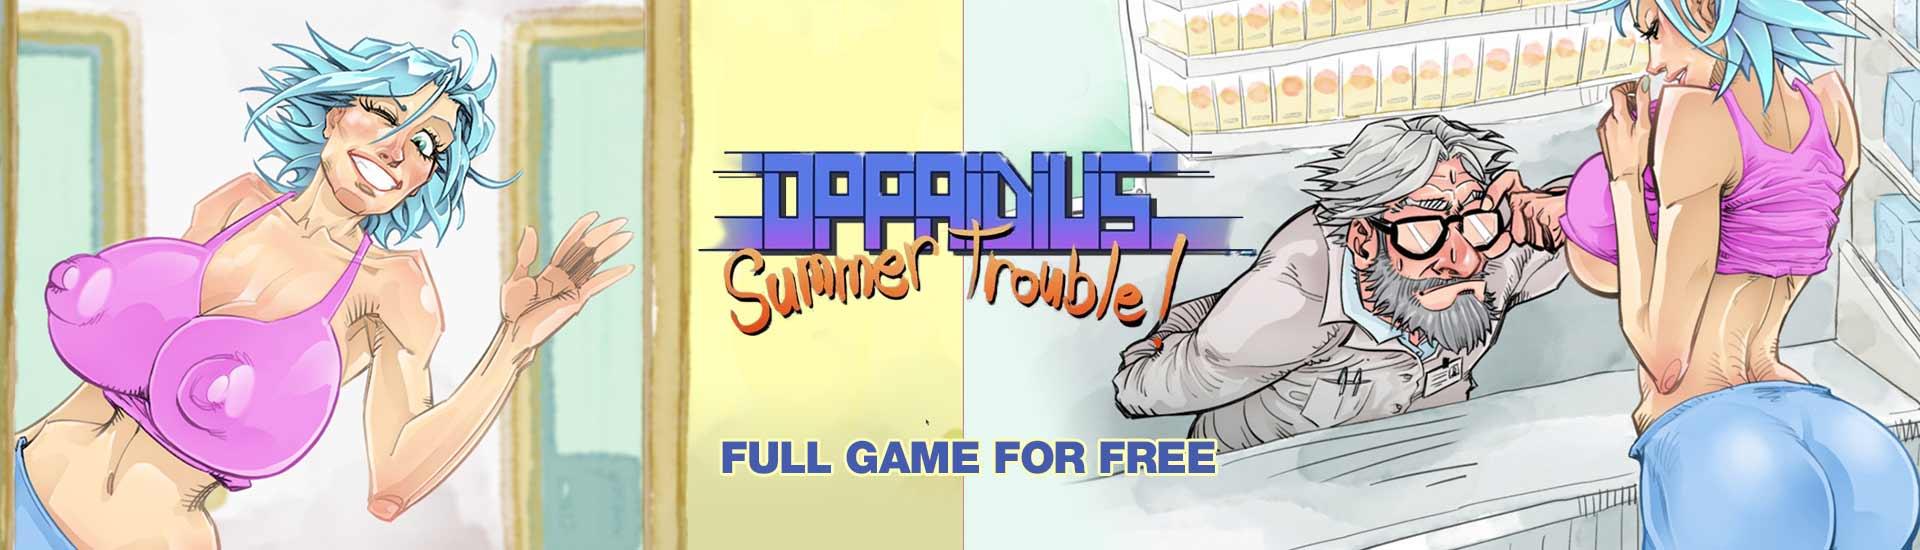 Gratis game Oppaidius Summer Trouble! @Indiegala